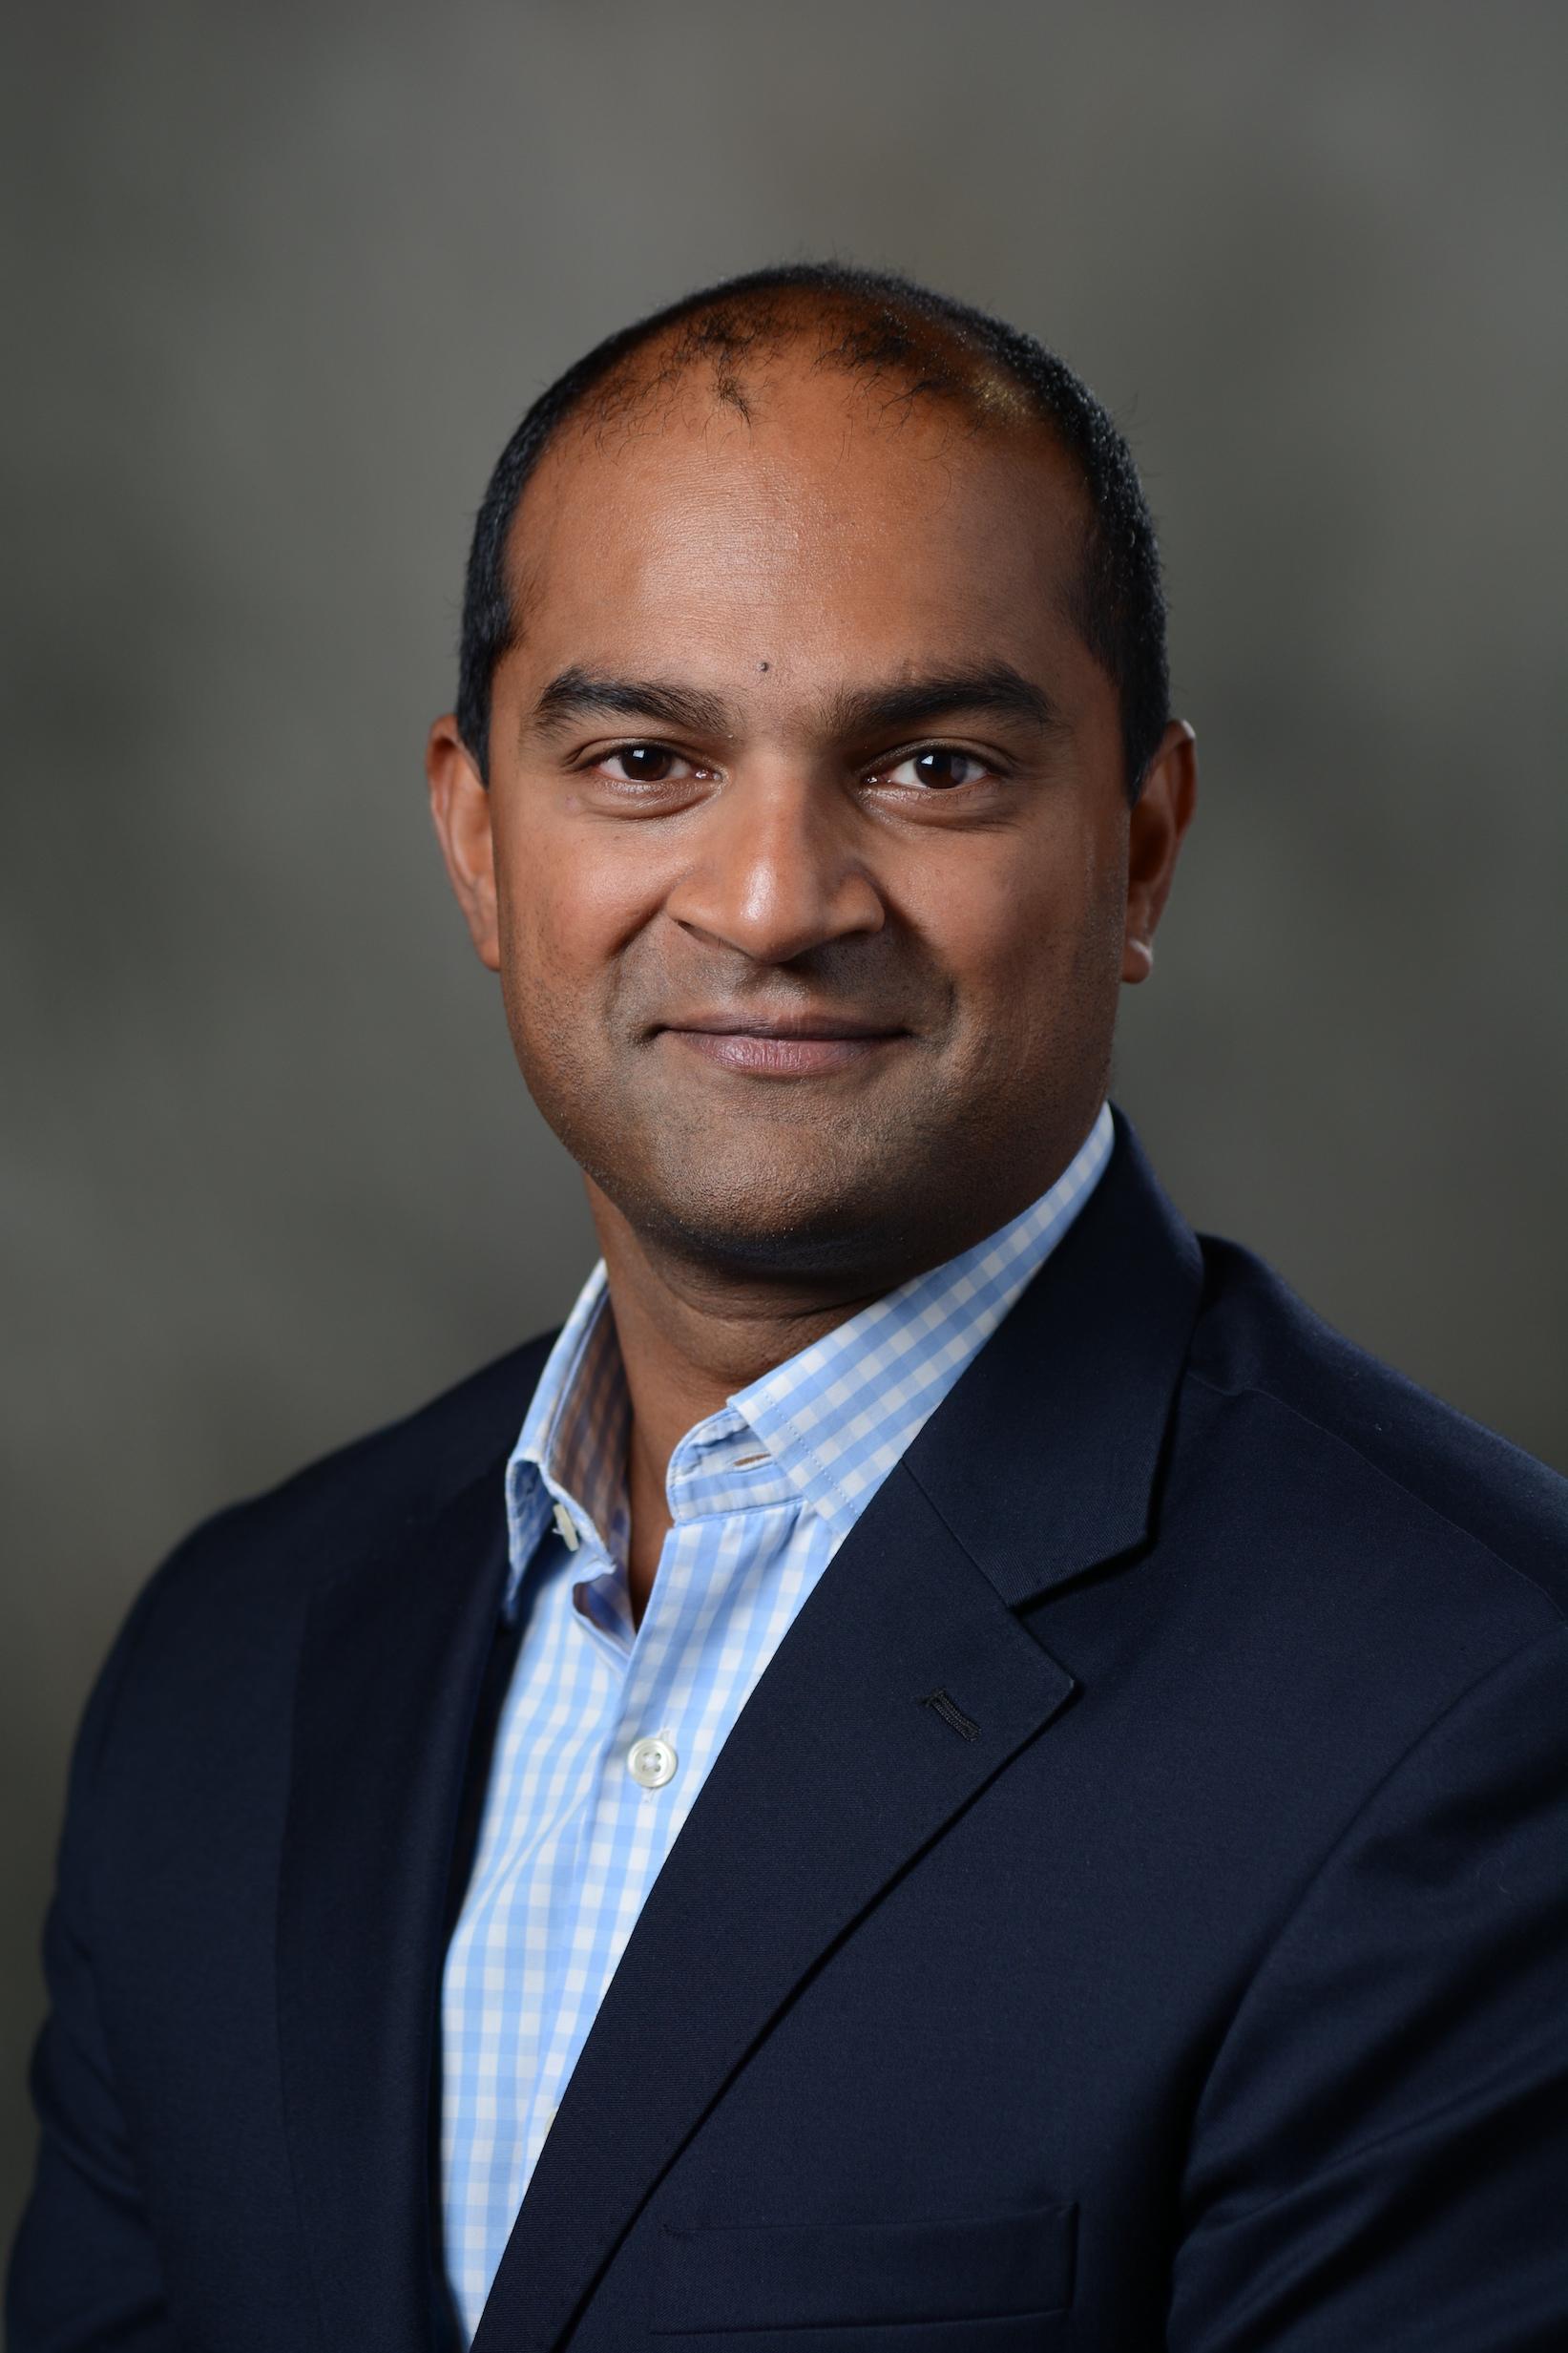 Dr Zudin Puthucheary